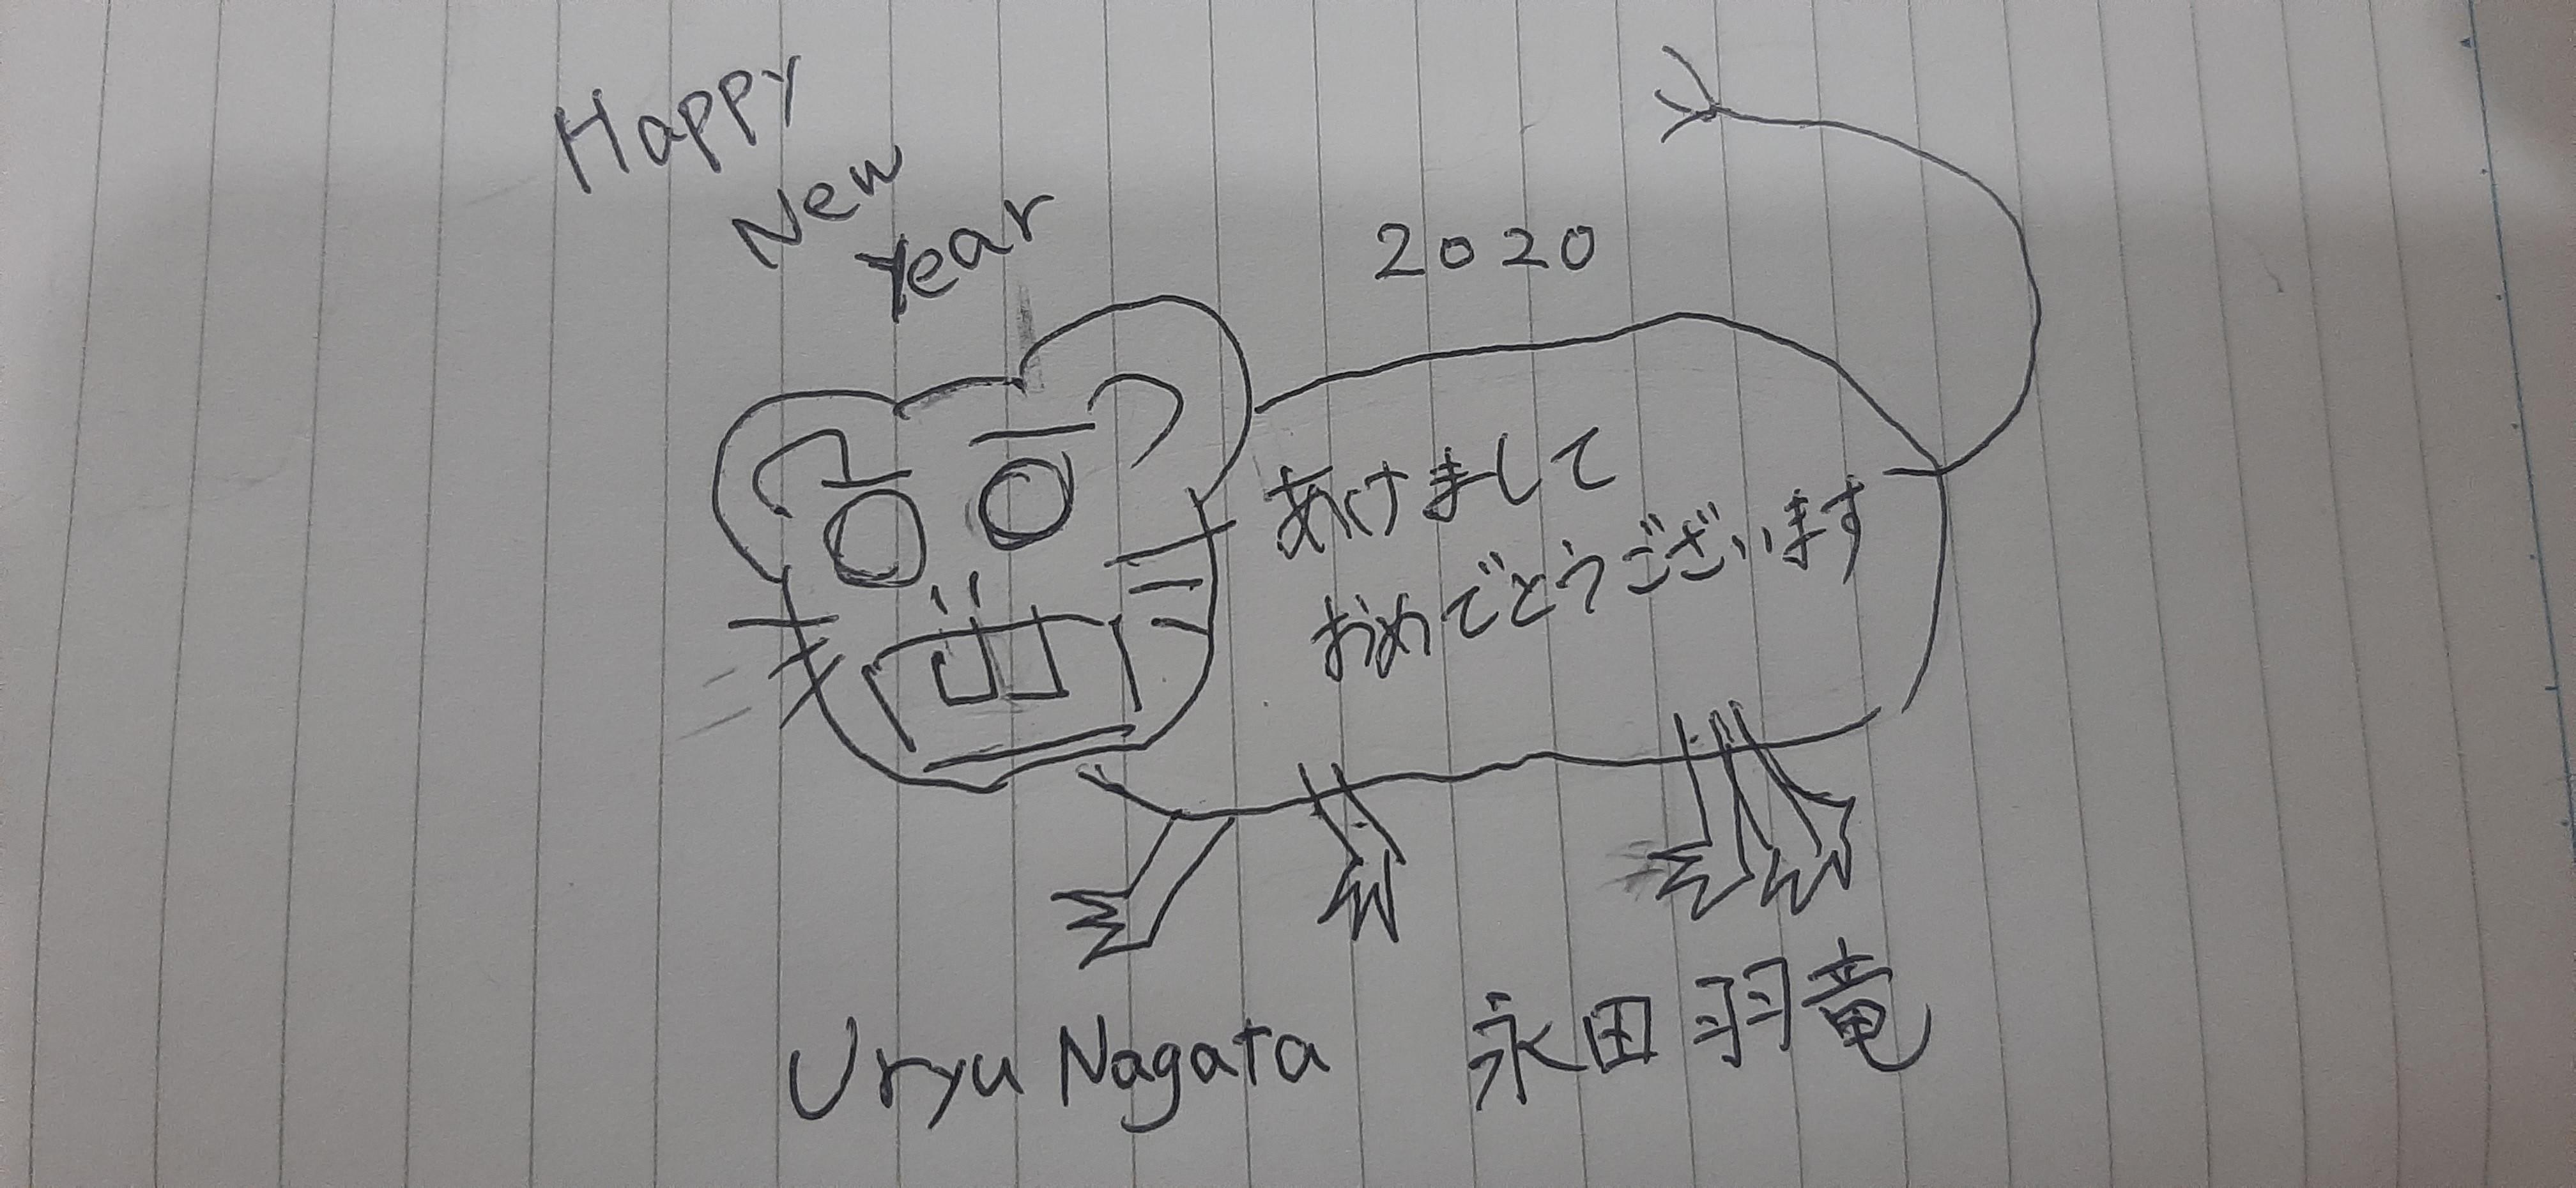 f:id:uryu19:20200101203629j:plain